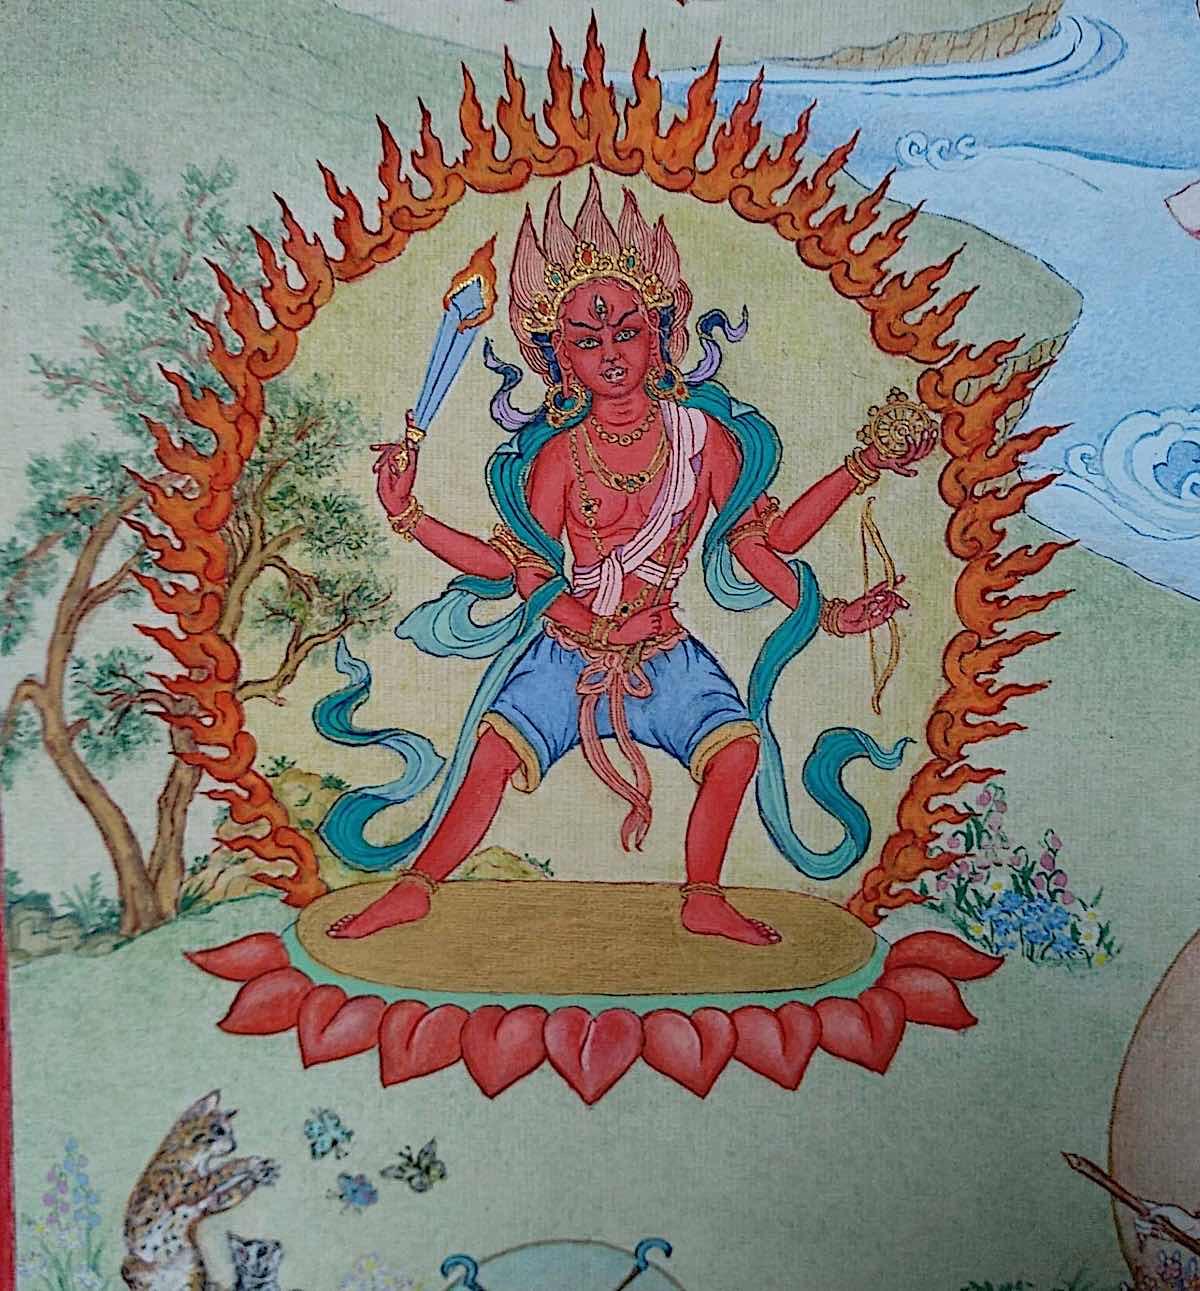 Buddha Weekly 13 Tara the Ripener Paripacaka Tara 21 Taras Thankha by Angeli Lhadripa Shkonda Buddhism